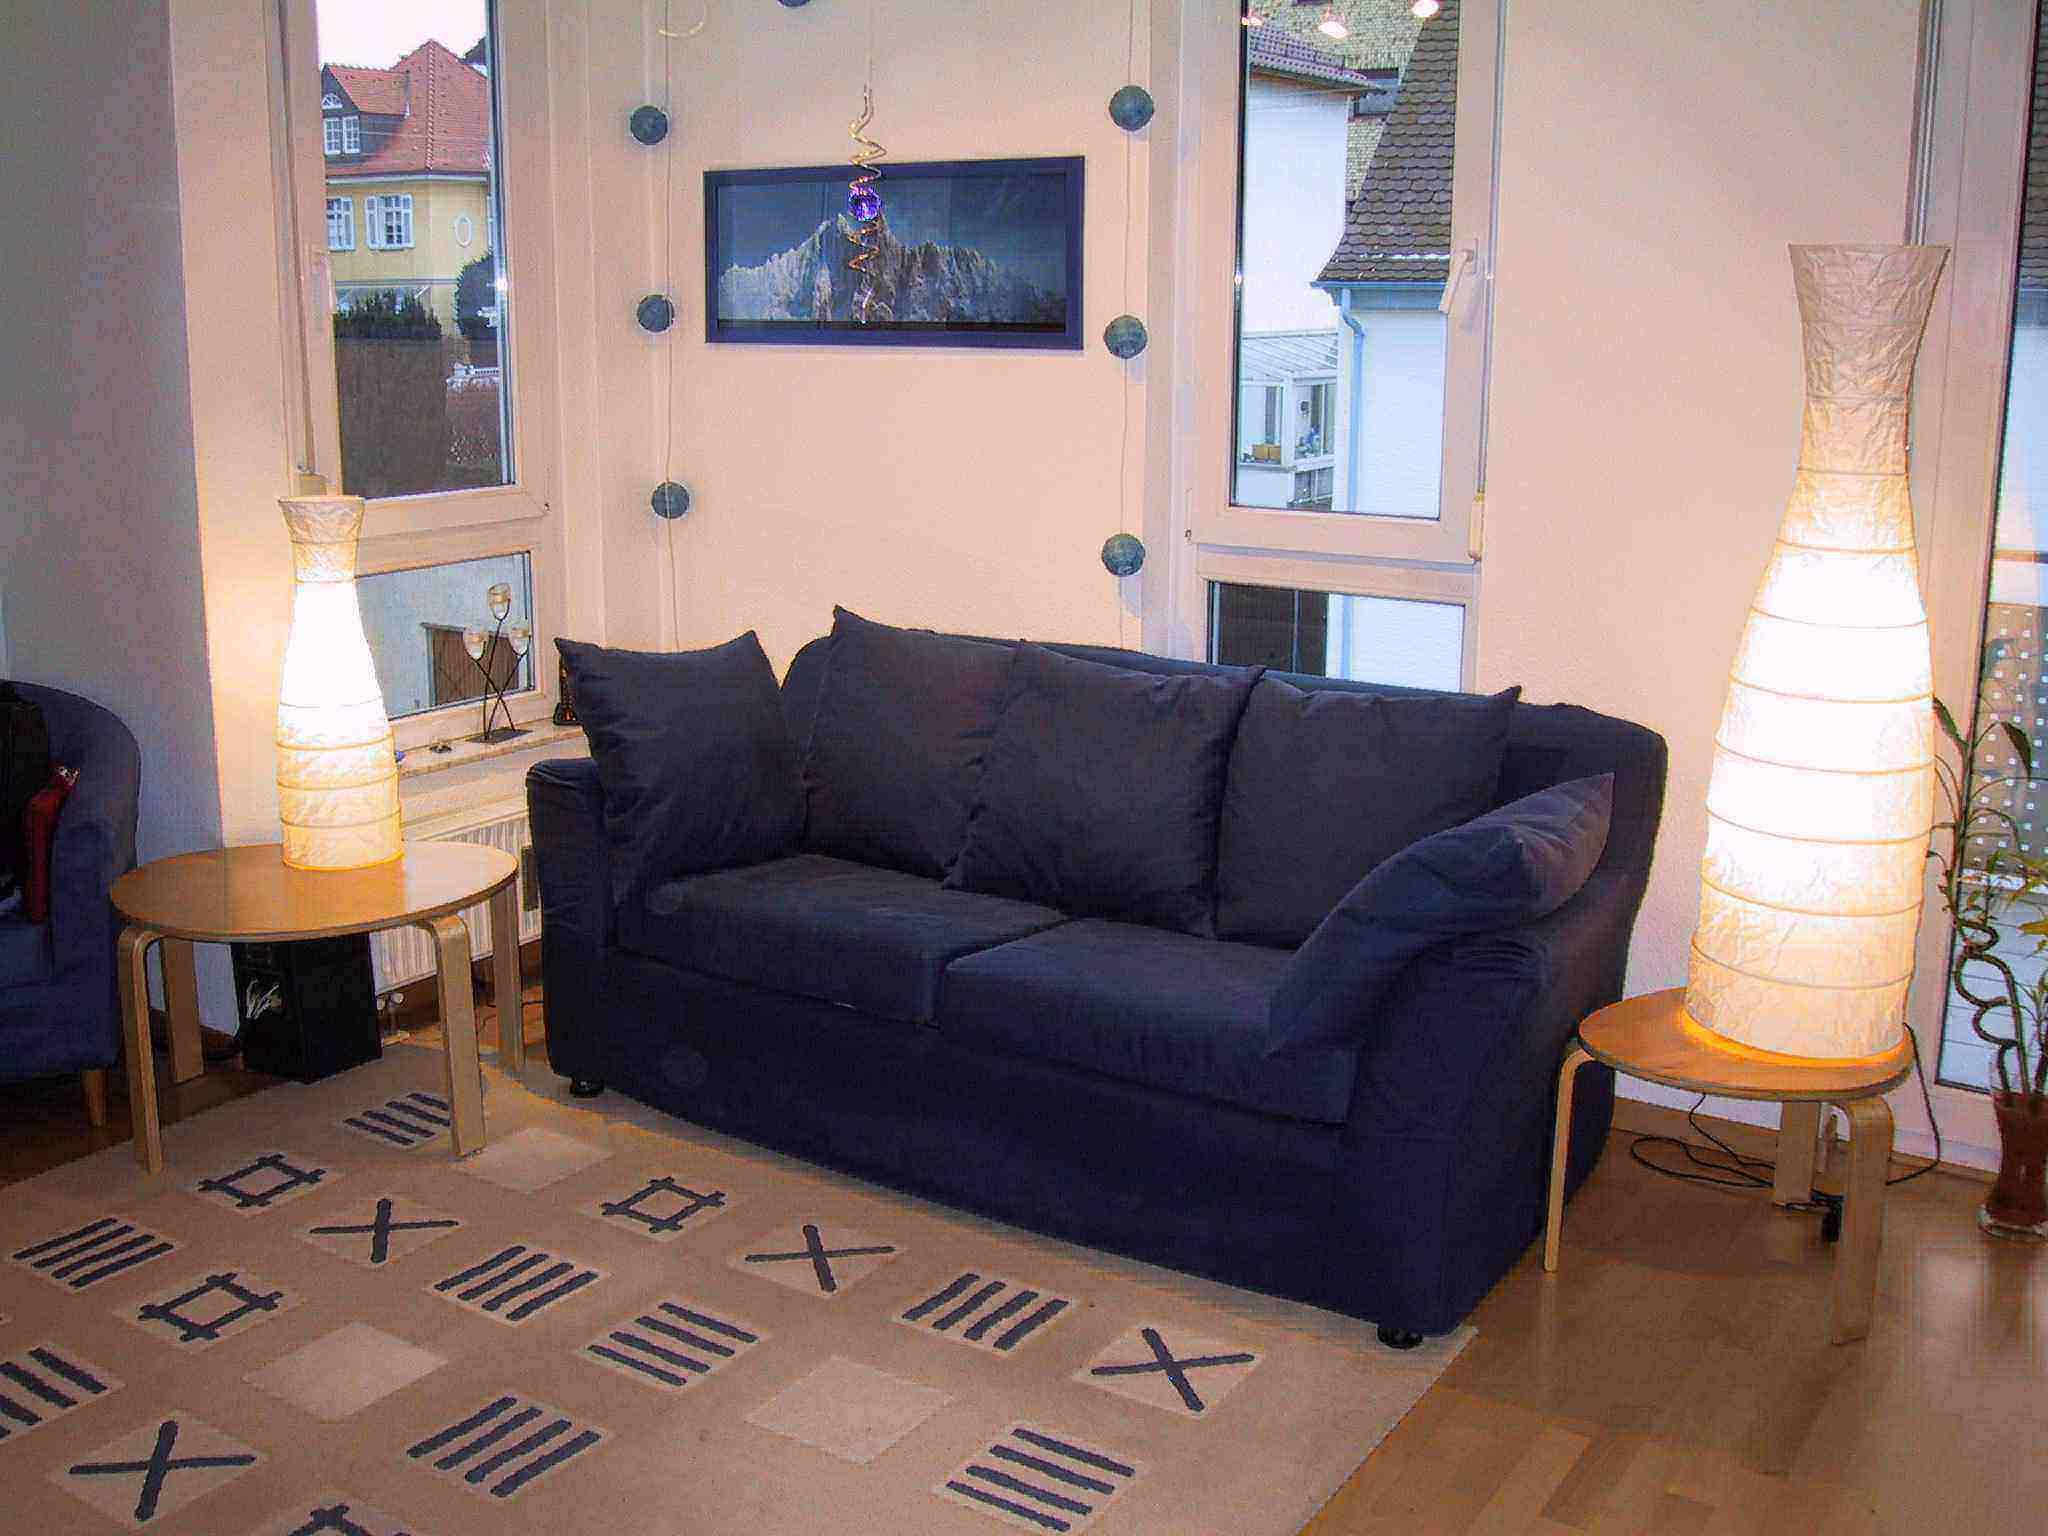 schlafsofa blau zweisitzer in 71636 ludwigsburg polster sessel couch. Black Bedroom Furniture Sets. Home Design Ideas